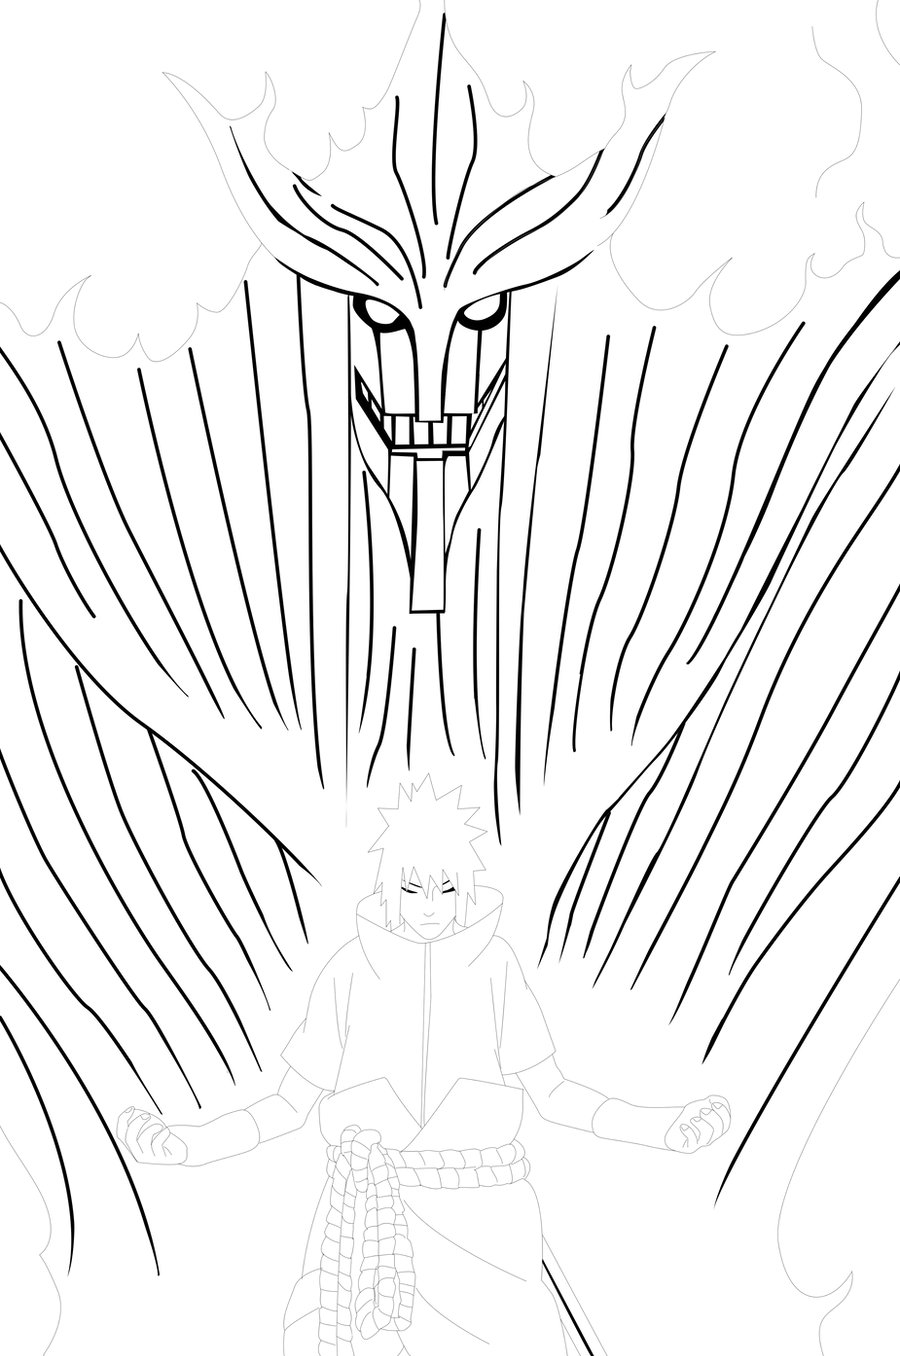 Line Art Vs Sketch : Naruto sasuke s susanoo lineart by bangalybashir on